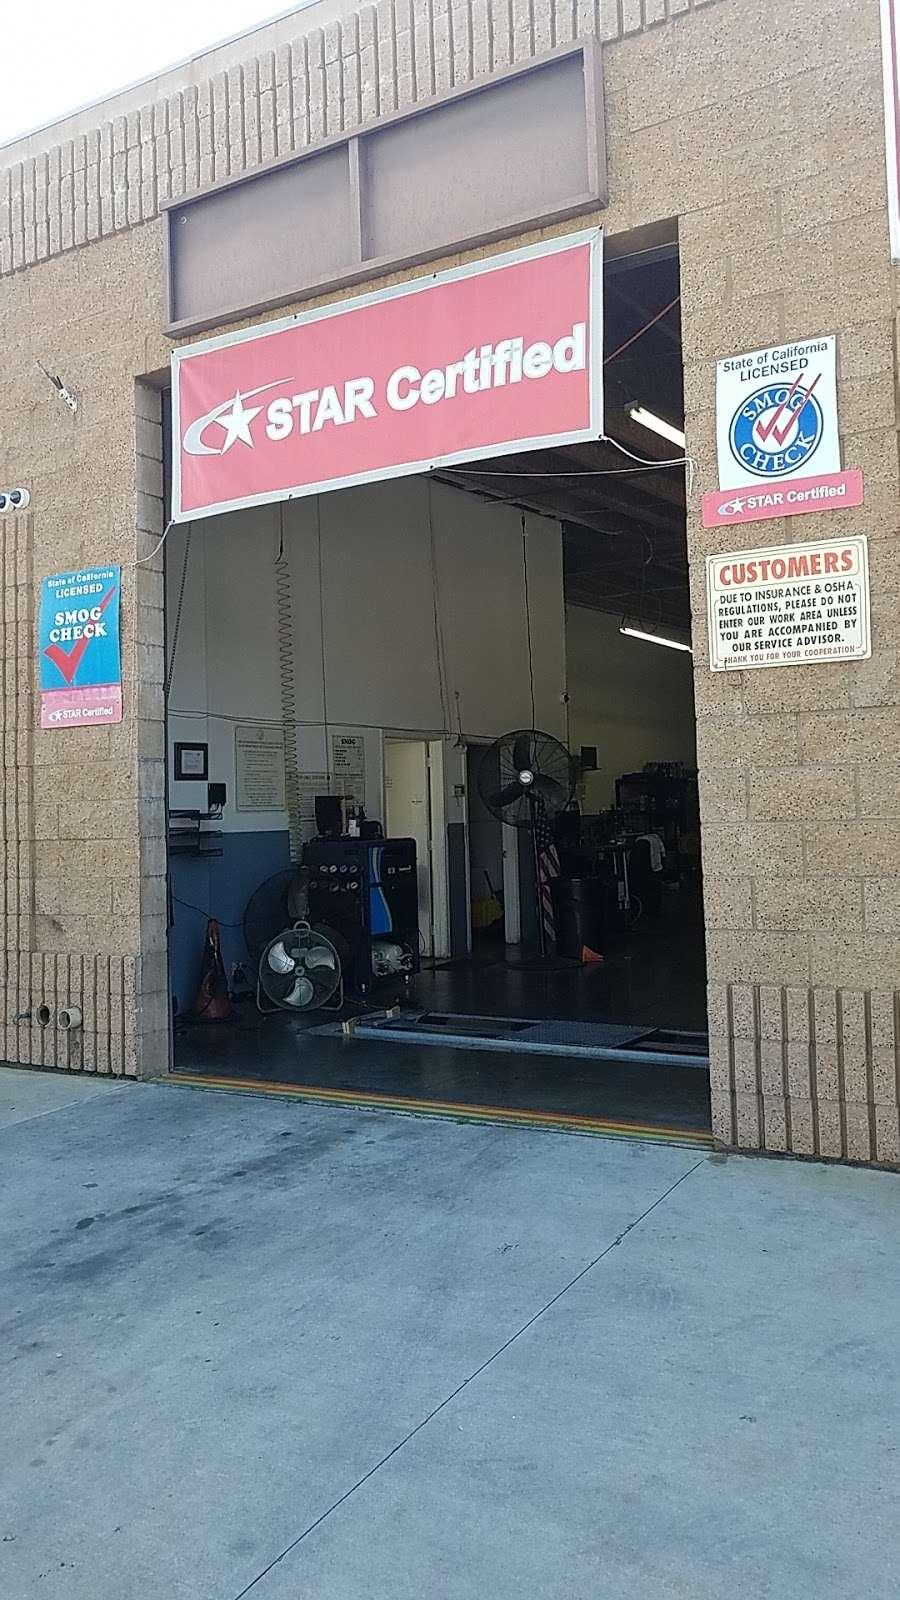 Covina Test Only - car repair    Photo 1 of 2   Address: 650 Barranca Ave # C, Covina, CA 91723, USA   Phone: (626) 610-6975